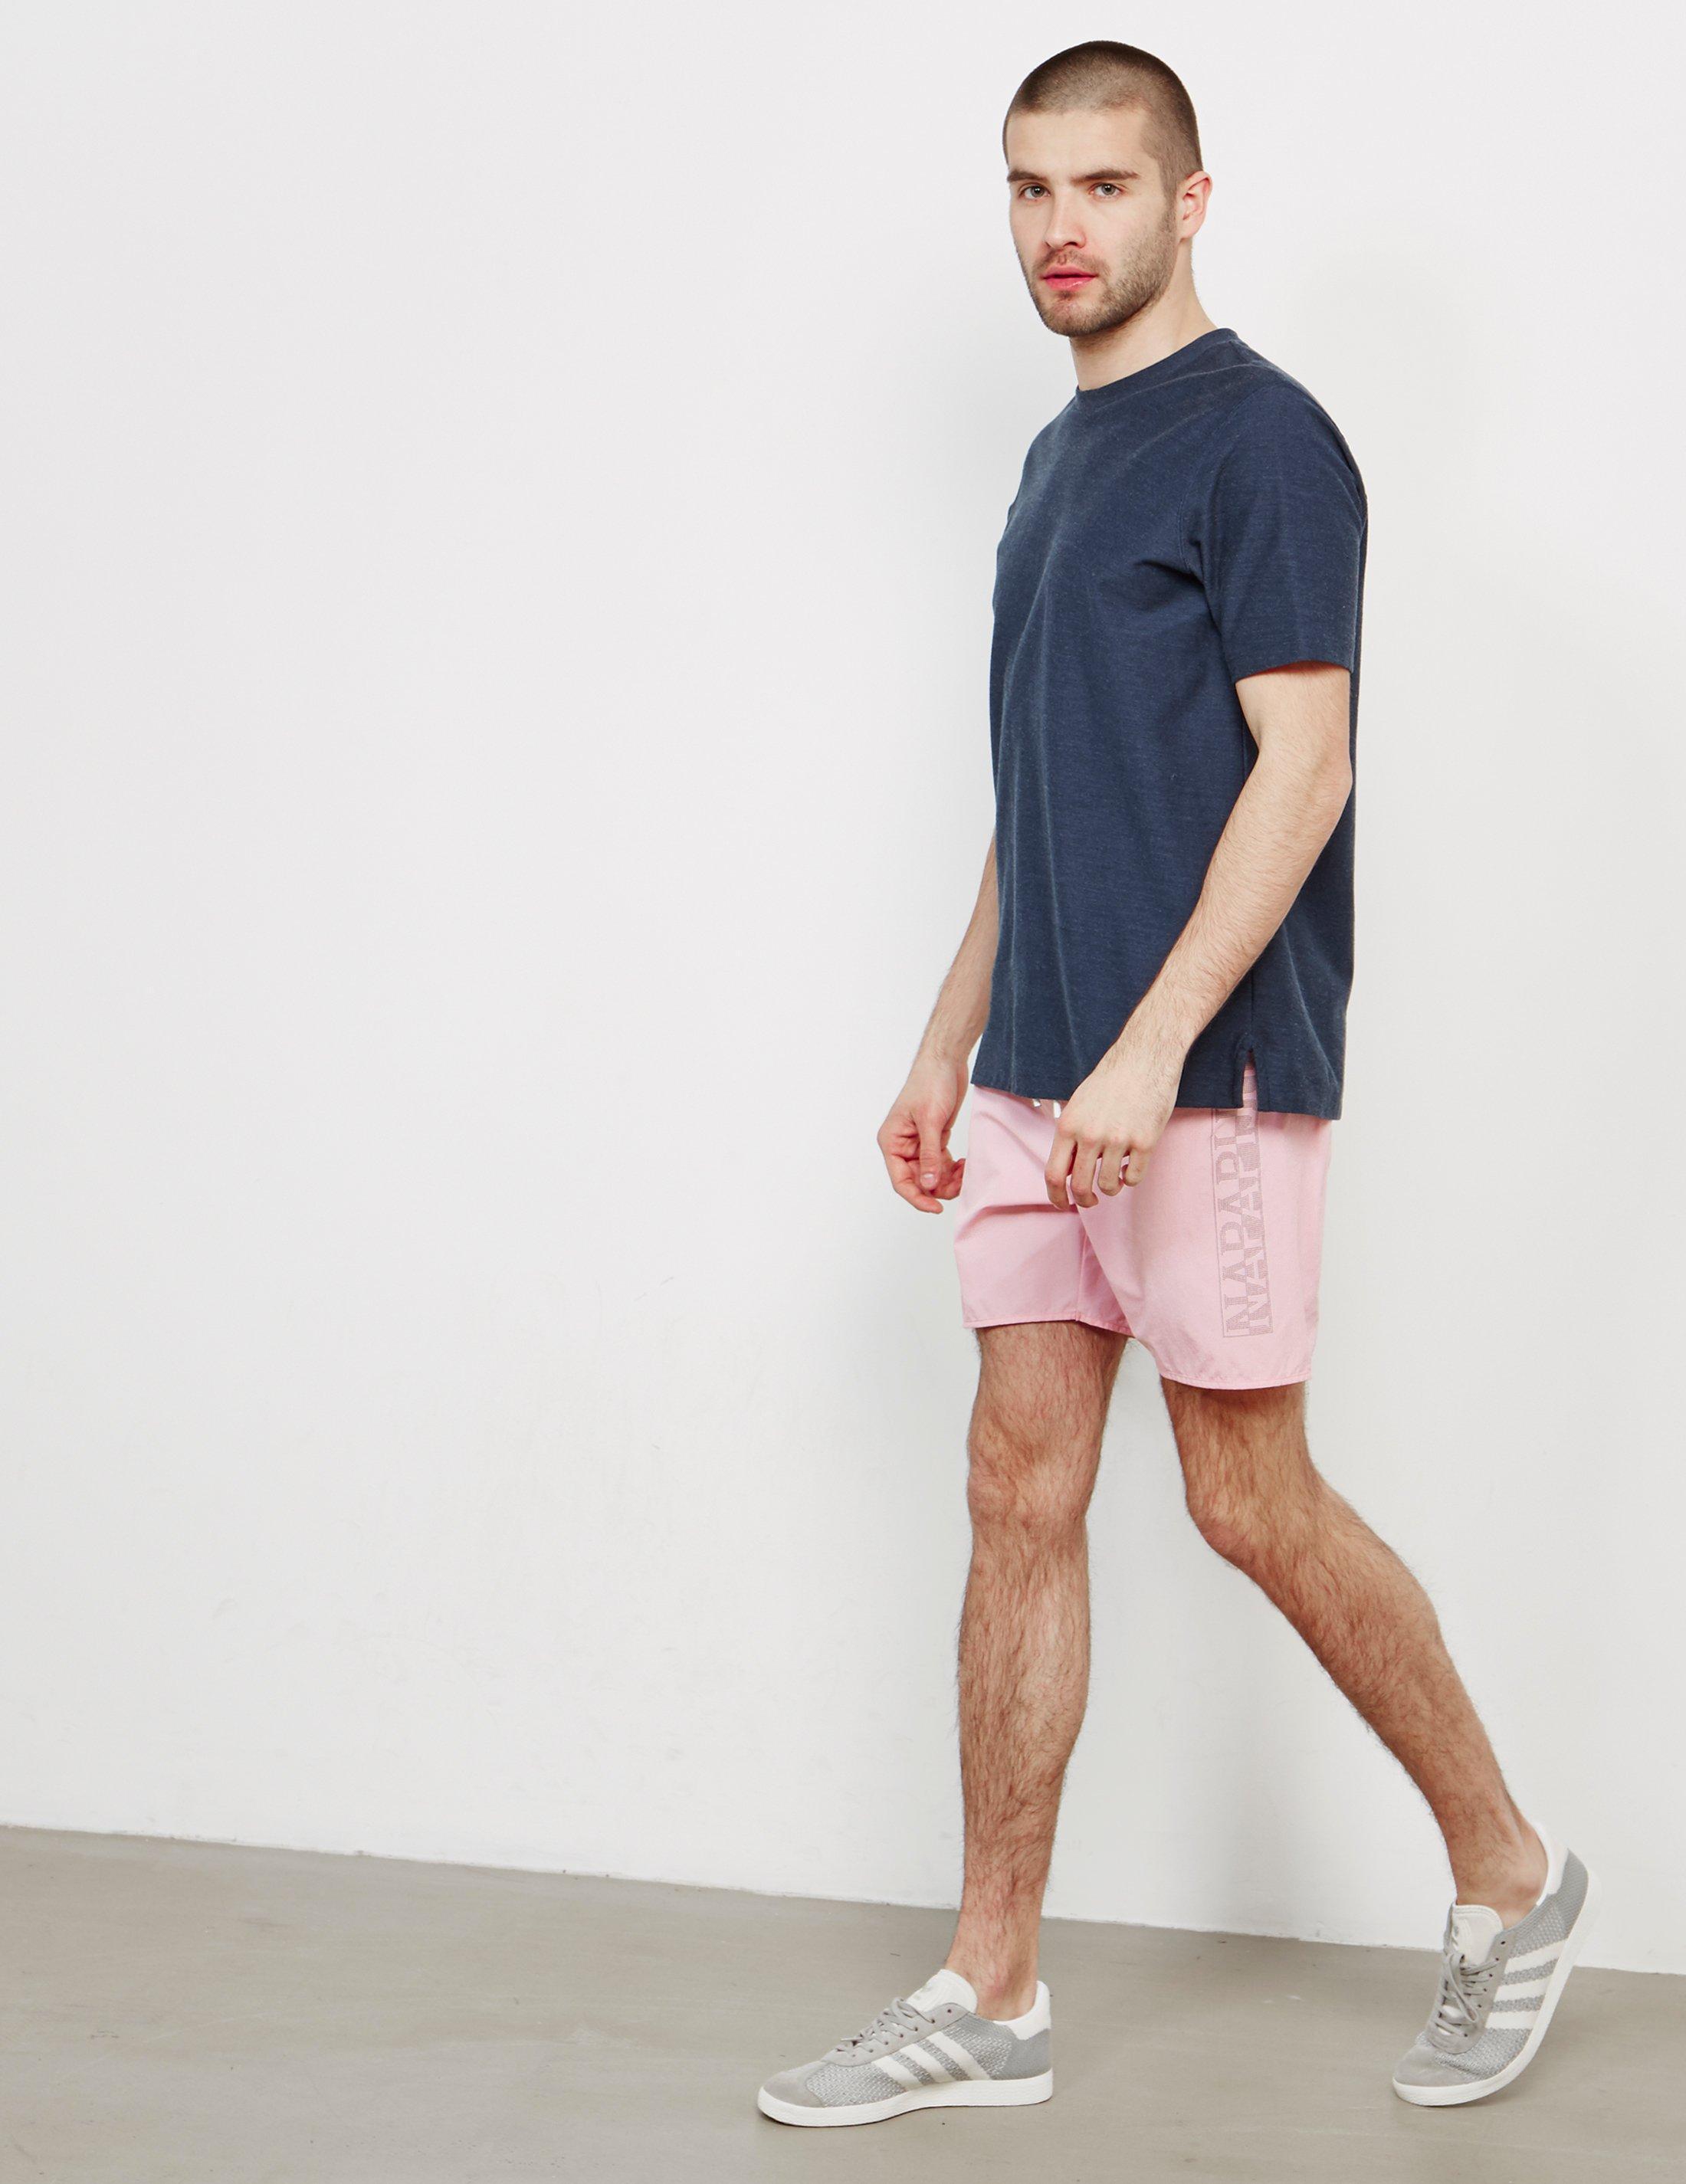 f3309e9040 Napapijri Varco Swim Shorts - Exclusively To Tessuti Light Pink/light Pink  in Pink for Men - Lyst